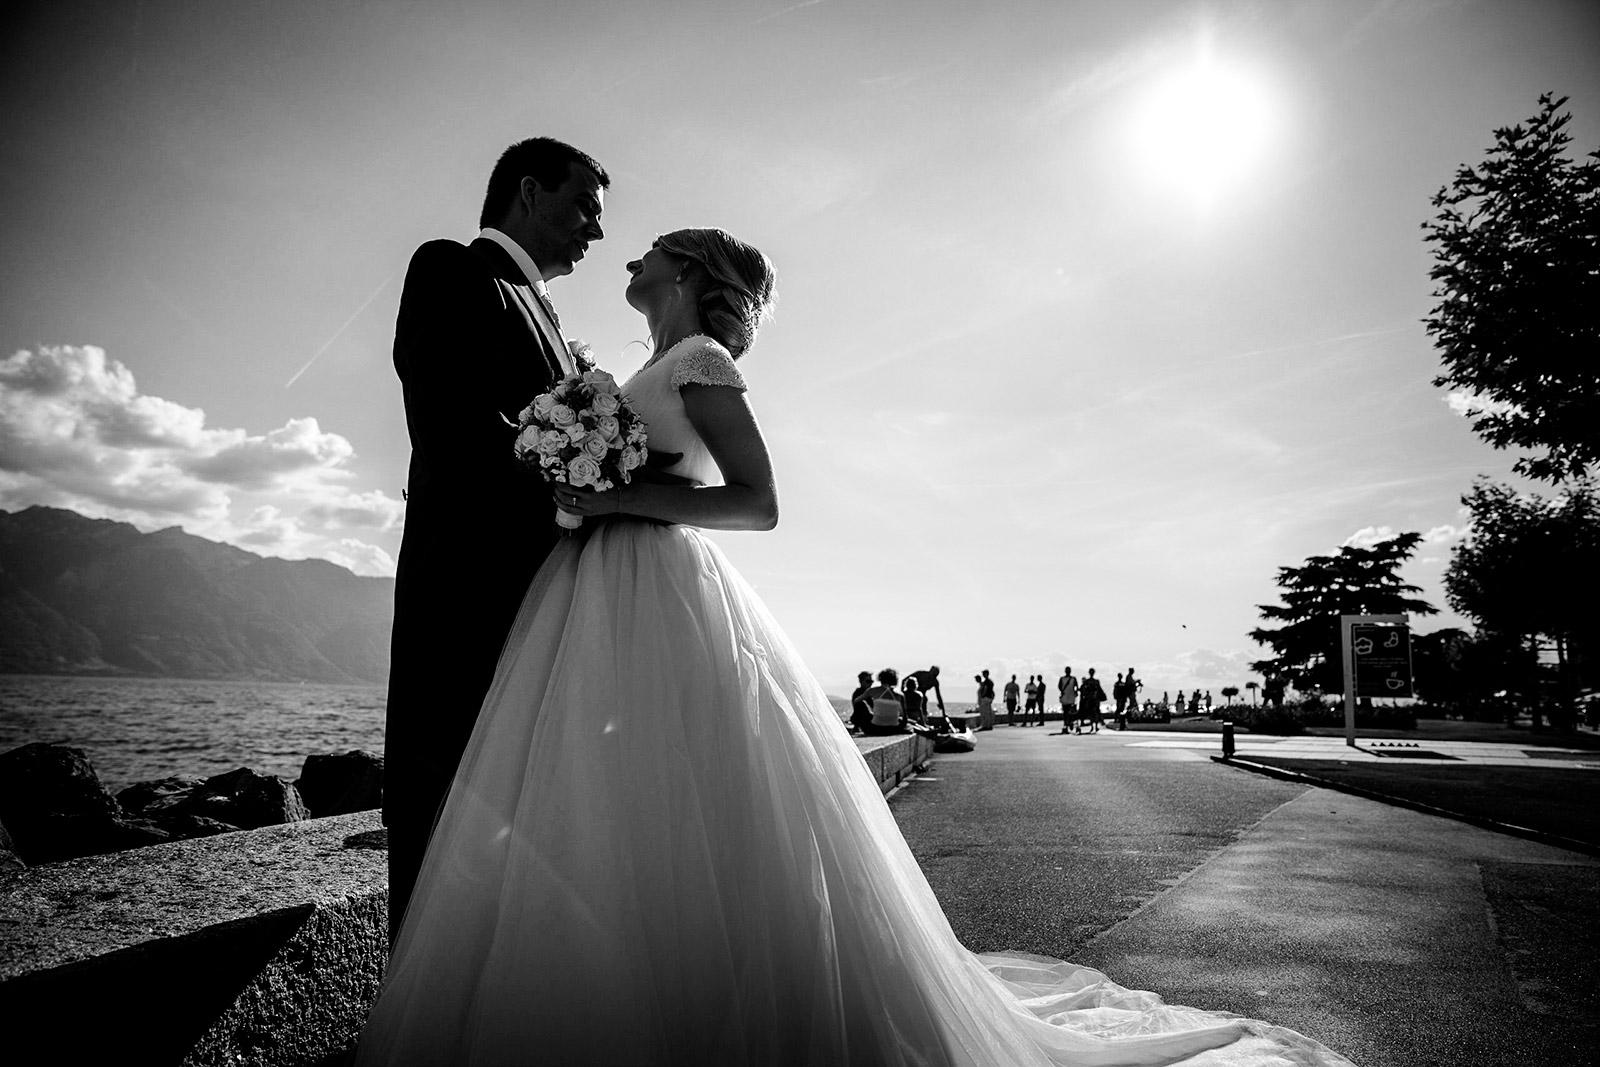 meilleur avis photographe de mariage Vevey photographe de mariage Vevey Suisse / Grand Hotel du Lac